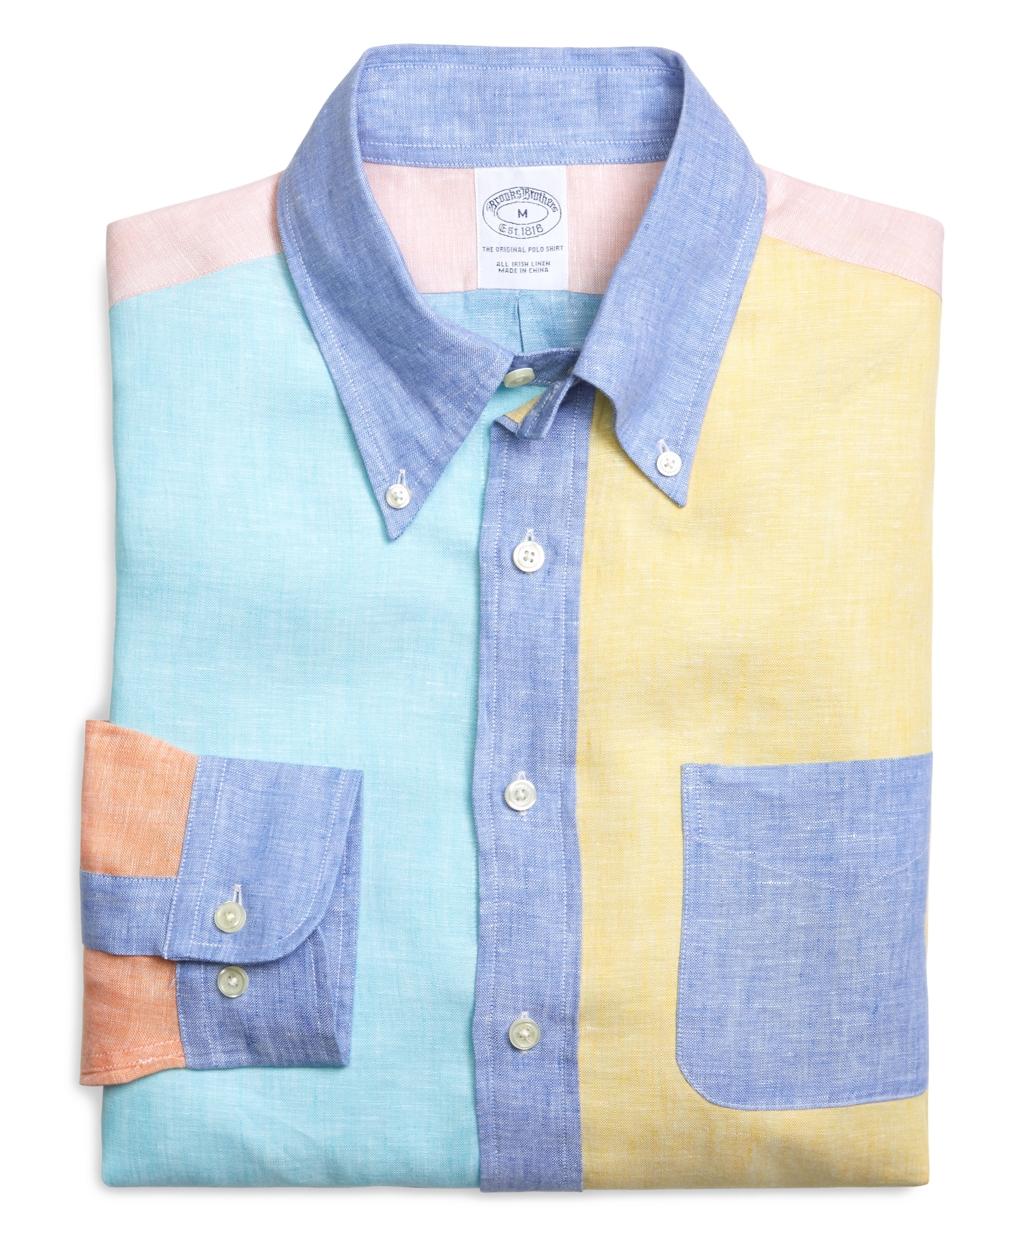 Brooks brothers regular fit solid fun linen sport shirt for Brooks brothers sports shirts